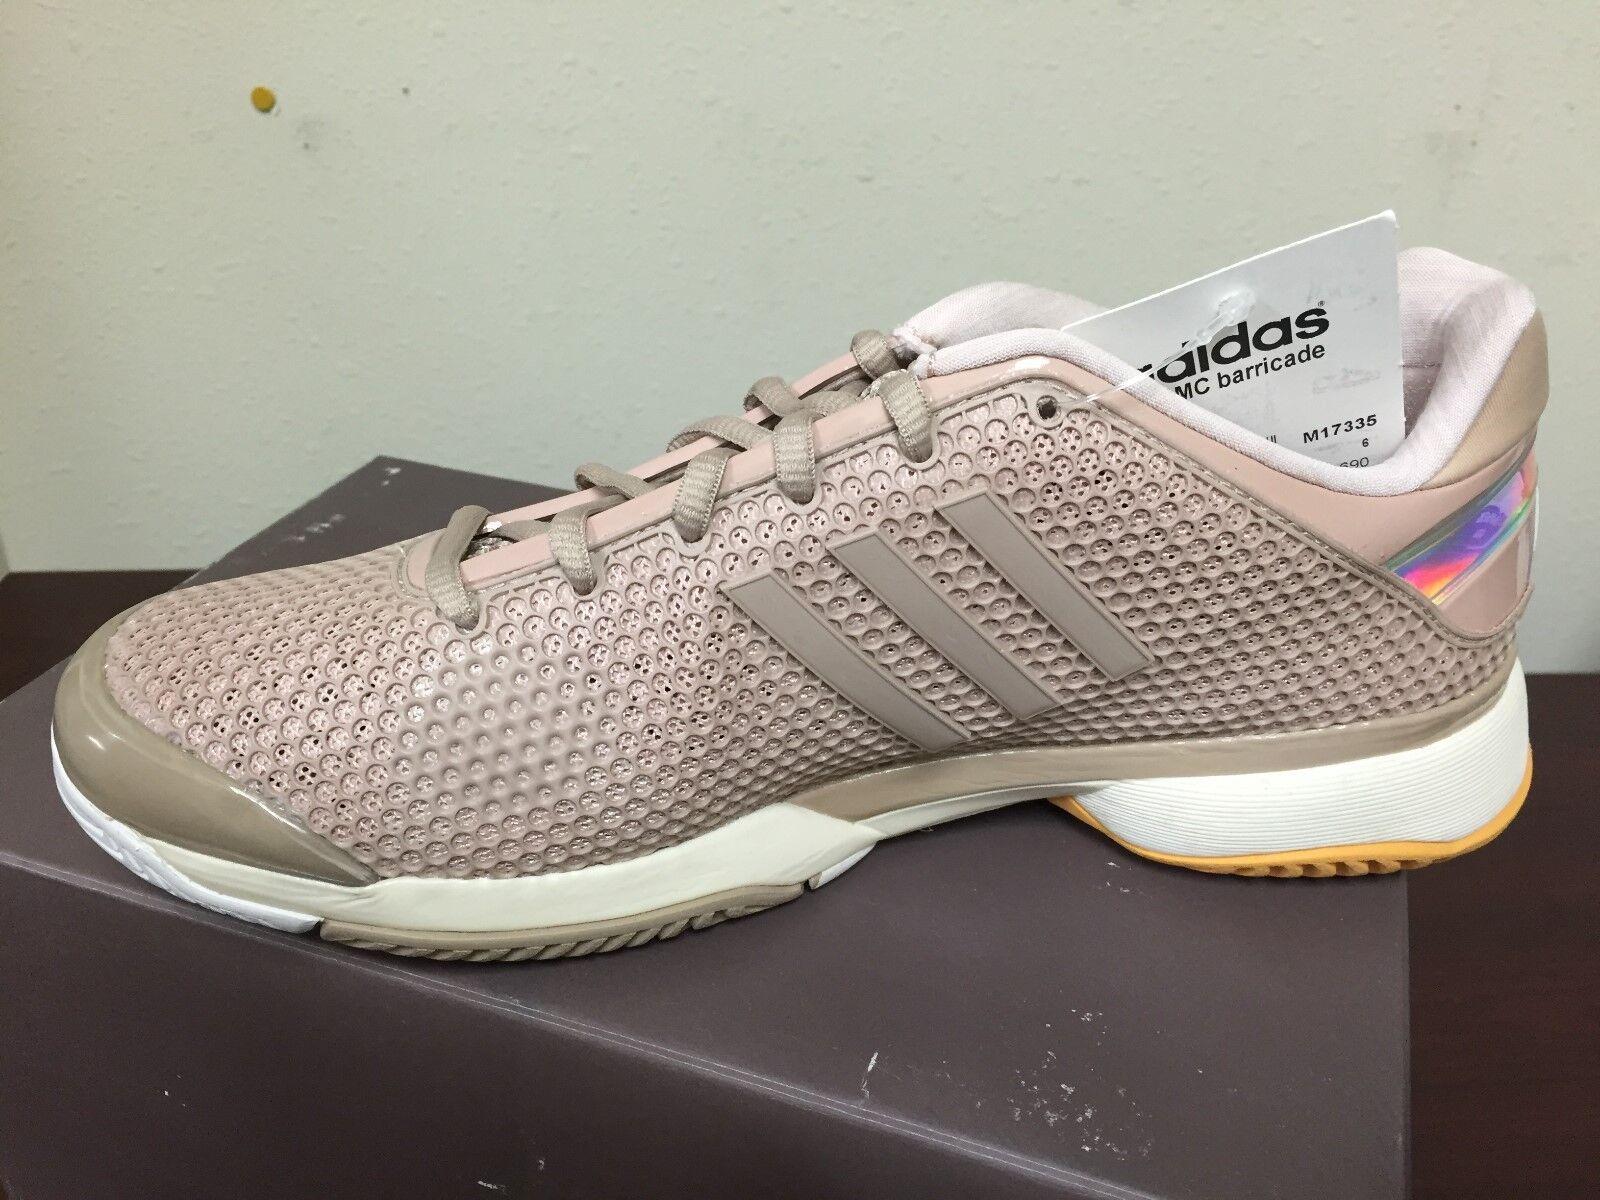 Chaussures de tennis pour femmes aSMC Barricade Adidas, style m17335